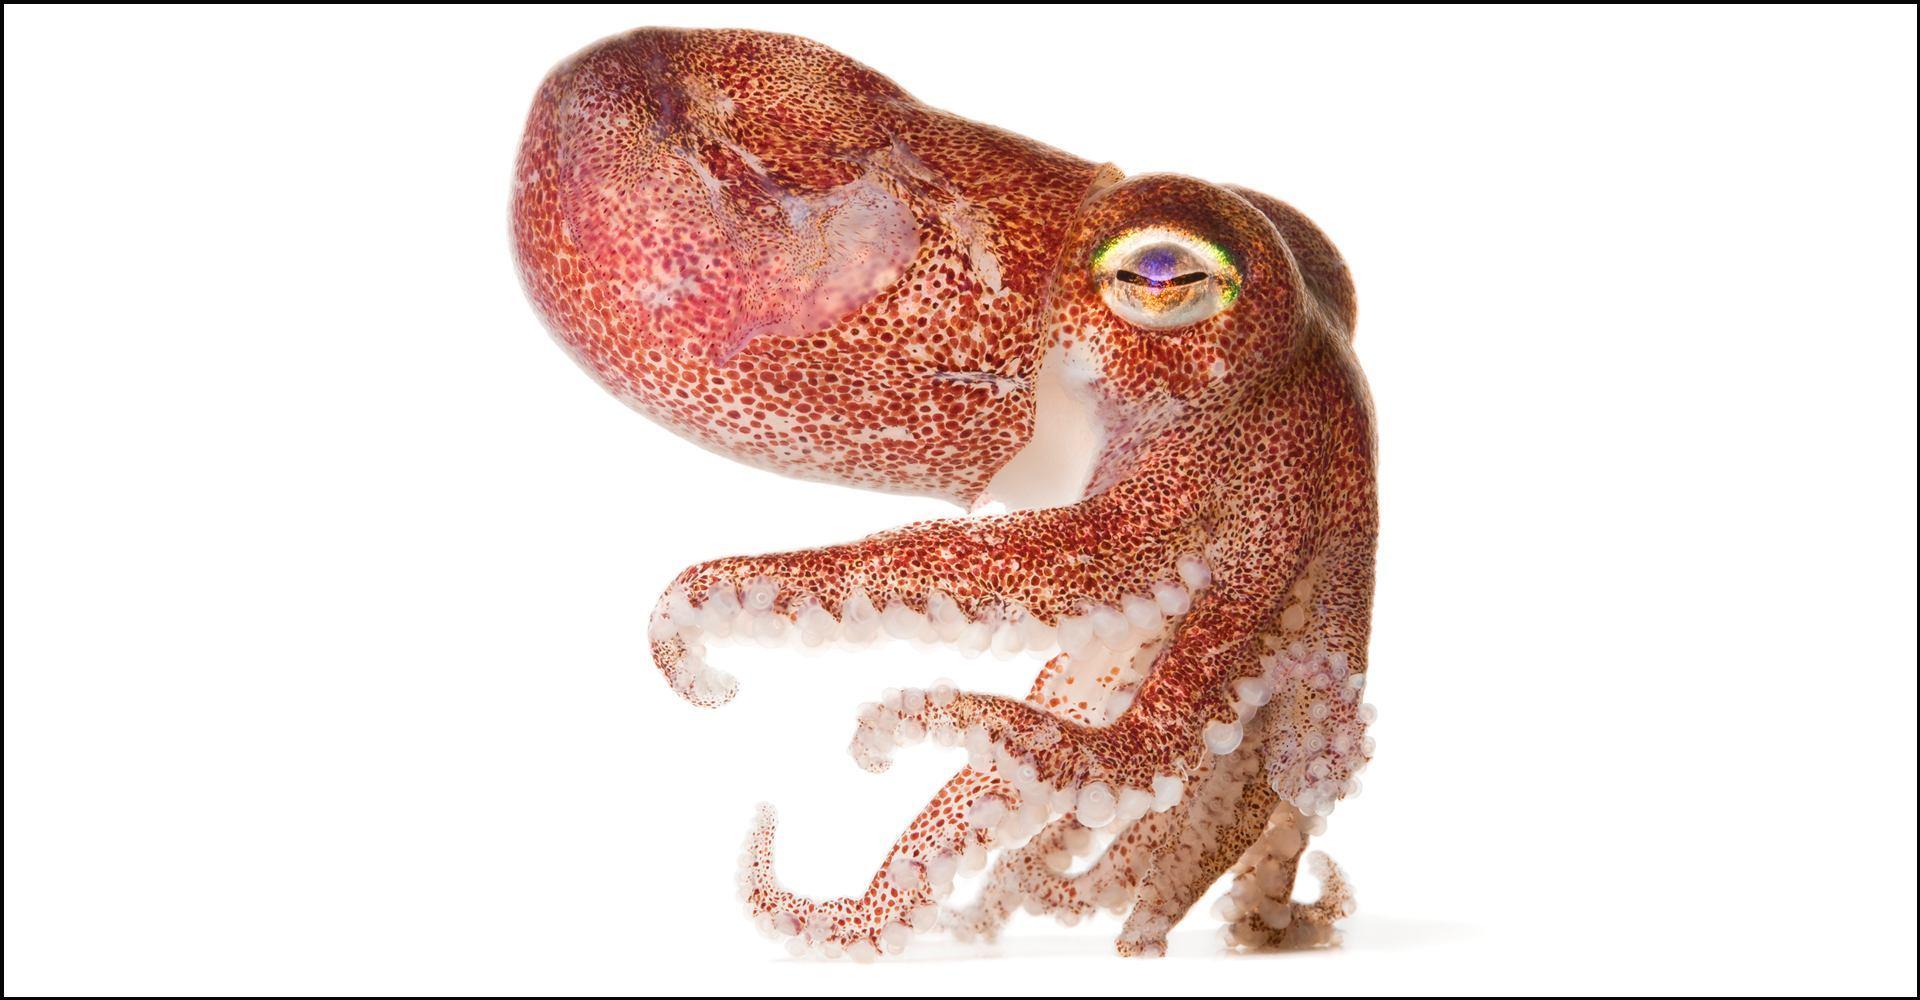 Spineless: Portraits of Marine Invertebrates, The Backbone of Life